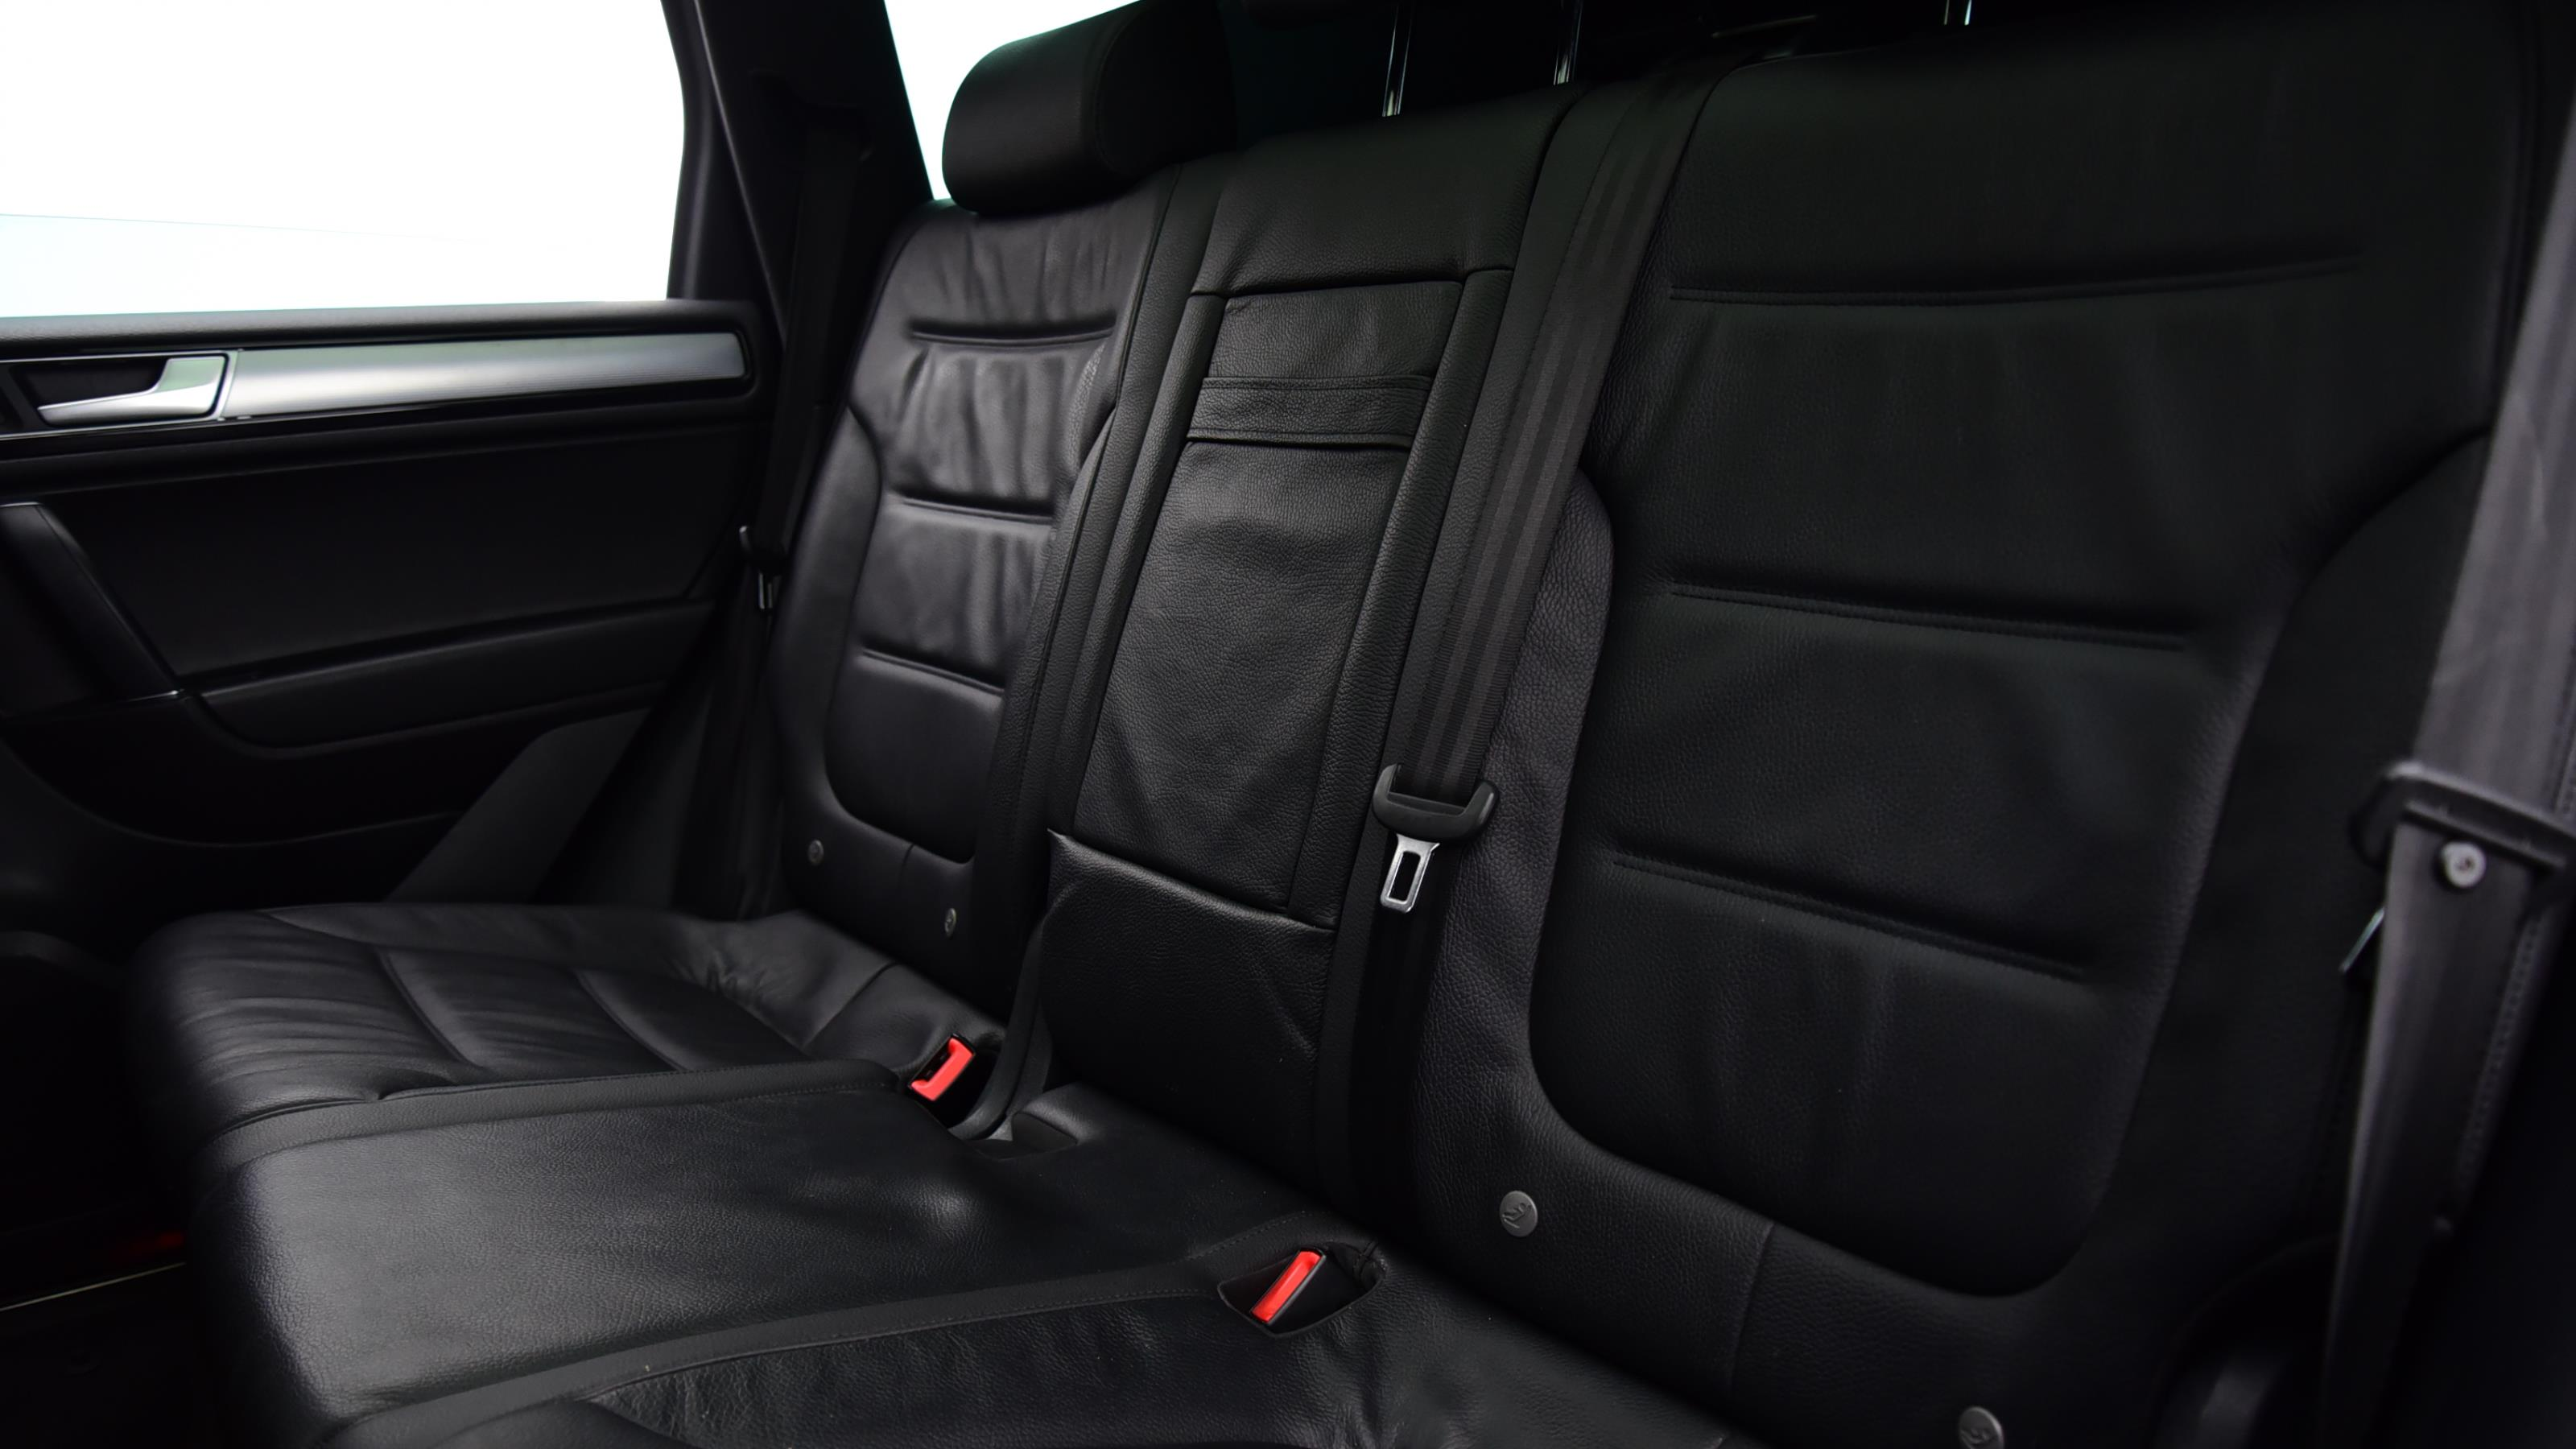 Used 2016 Volkswagen TOUAREG 3.0 V6 TDI BlueMotion Tech 262 R Line 5dr Tip Auto BLUE at Saxton4x4